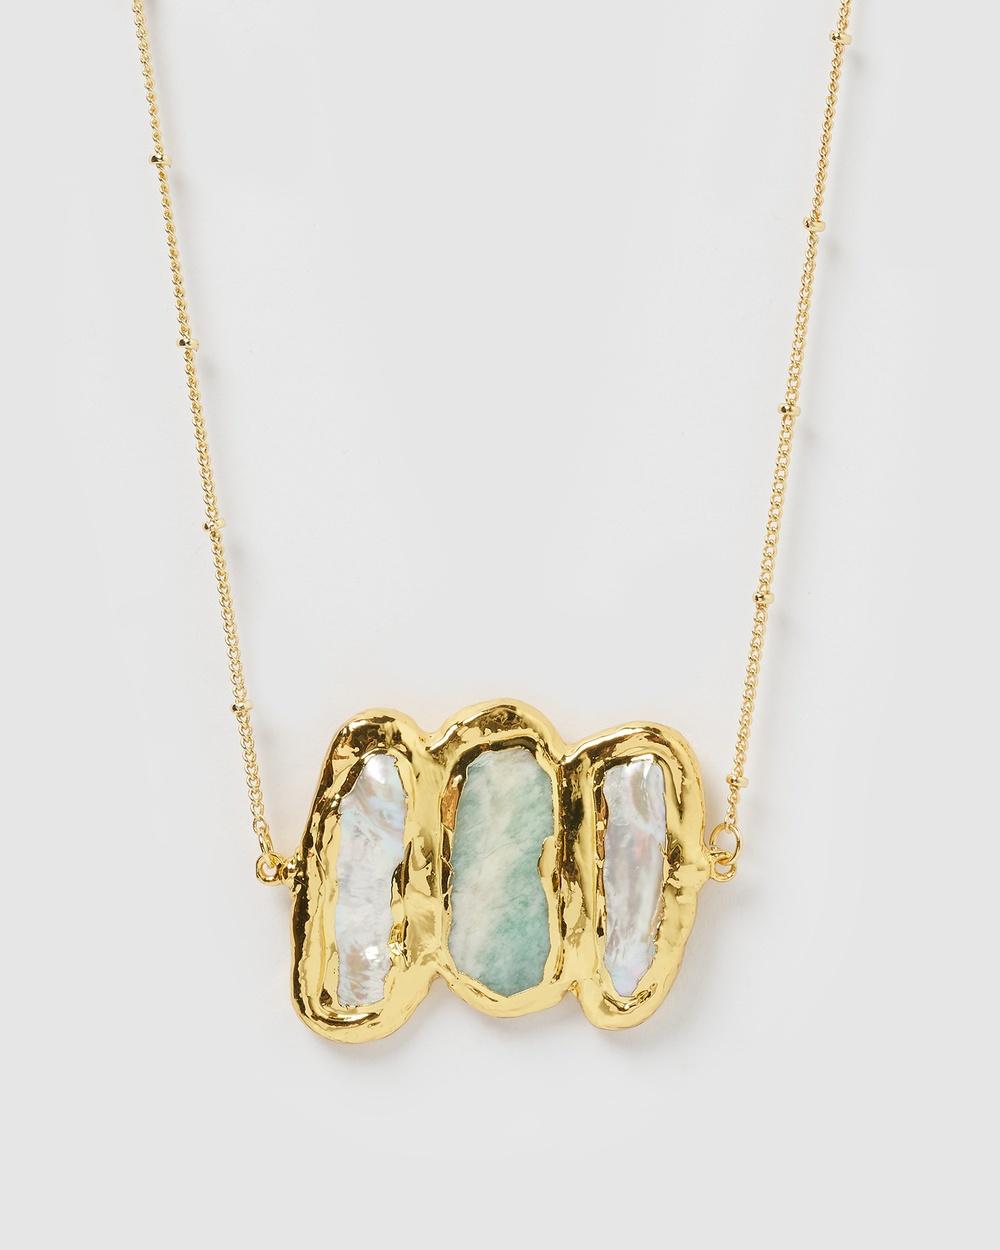 Miz Casa and Co Adri Necklace Jewellery Gold